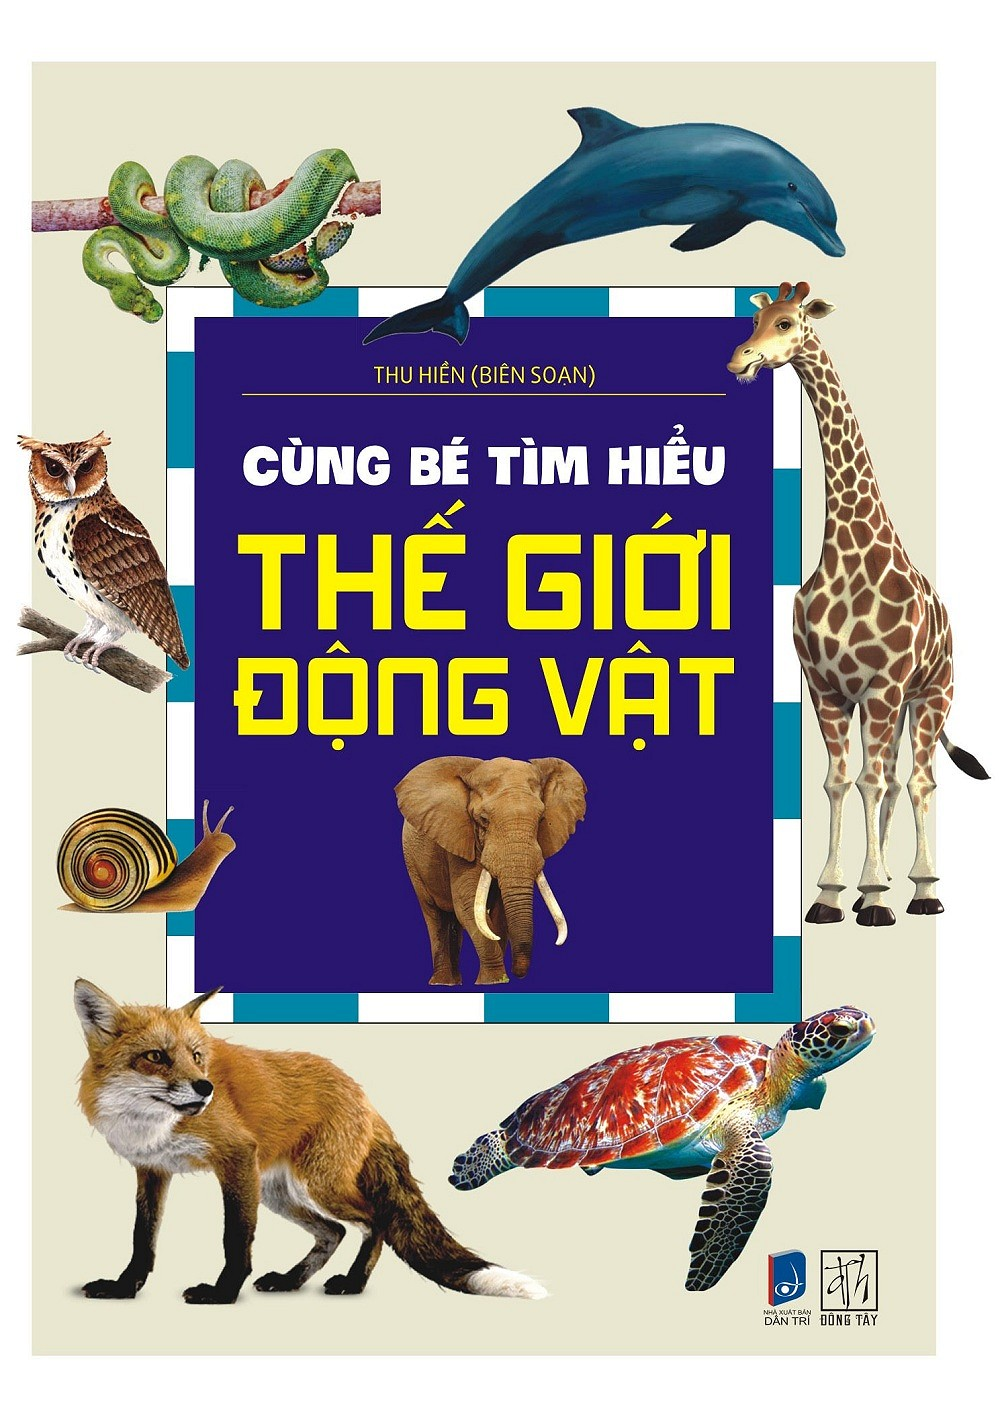 cung-be-tim-hieu-the-gioi-dong-vat-u547-d20161011-t161609-275308.u547.d20170113.t145823.559913.jpg